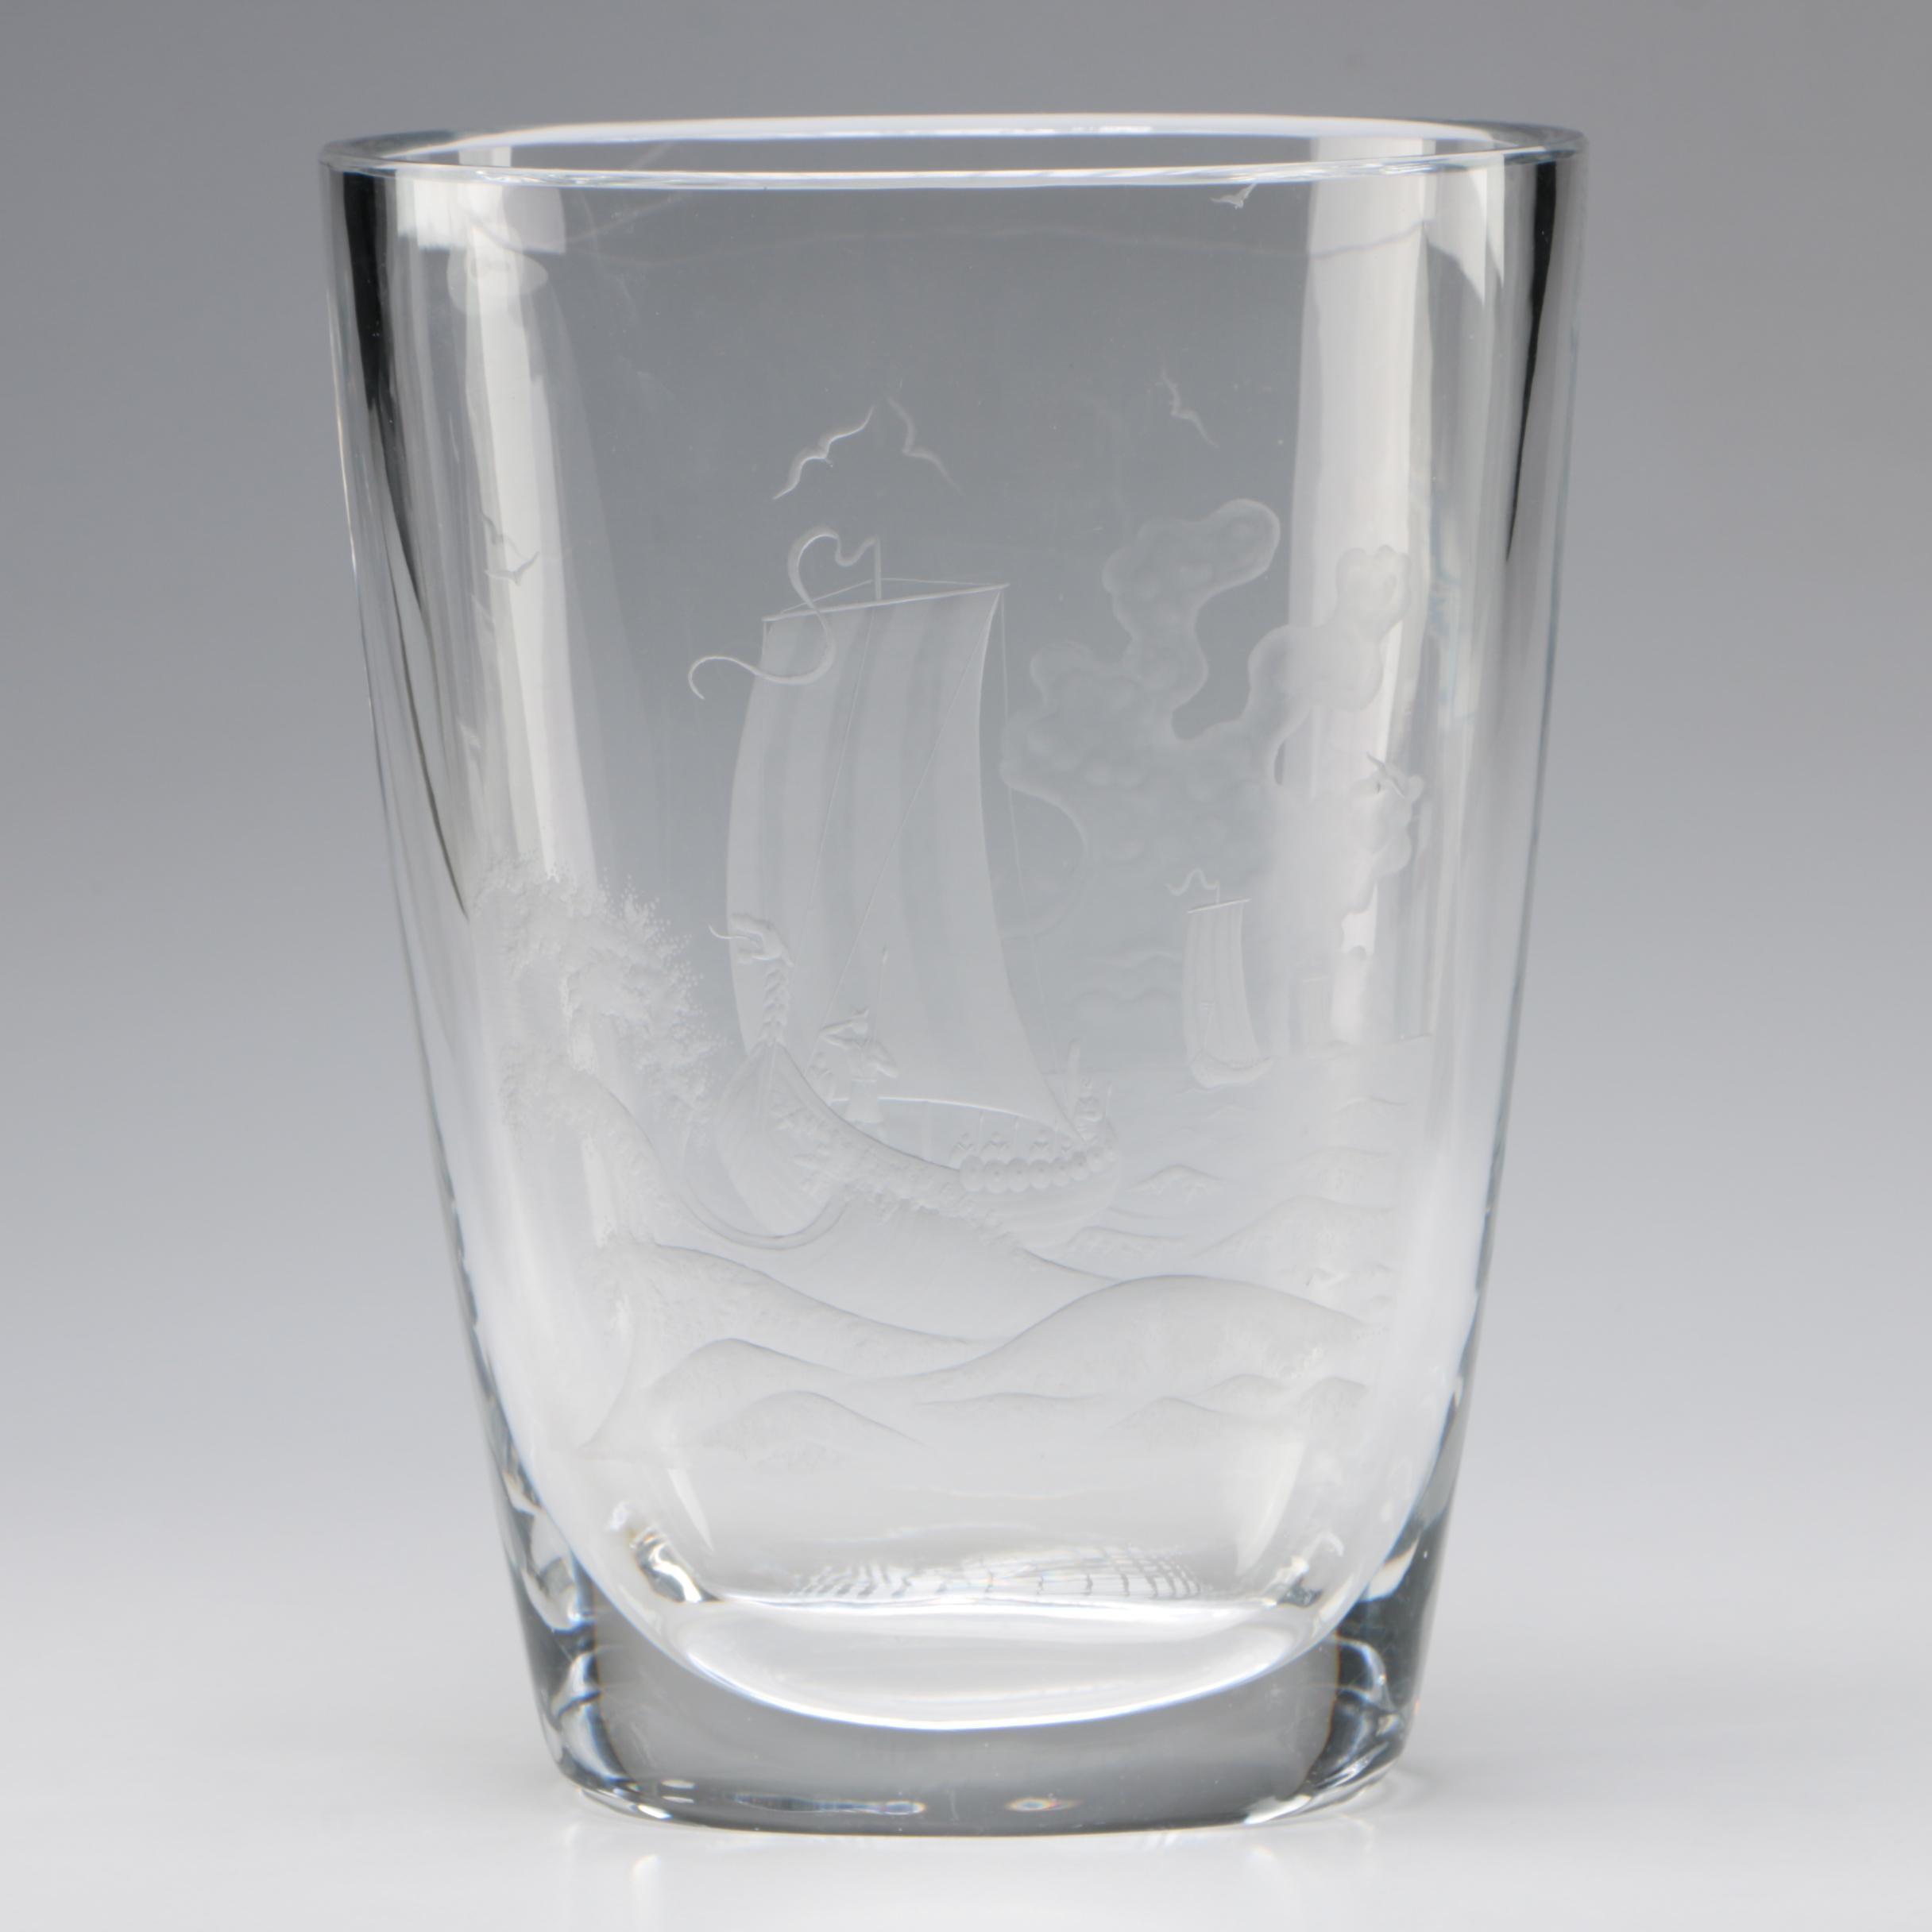 Orrefors Etched Viking Ship Crystal Vase Designed by Nils Landberg, Mid-Century